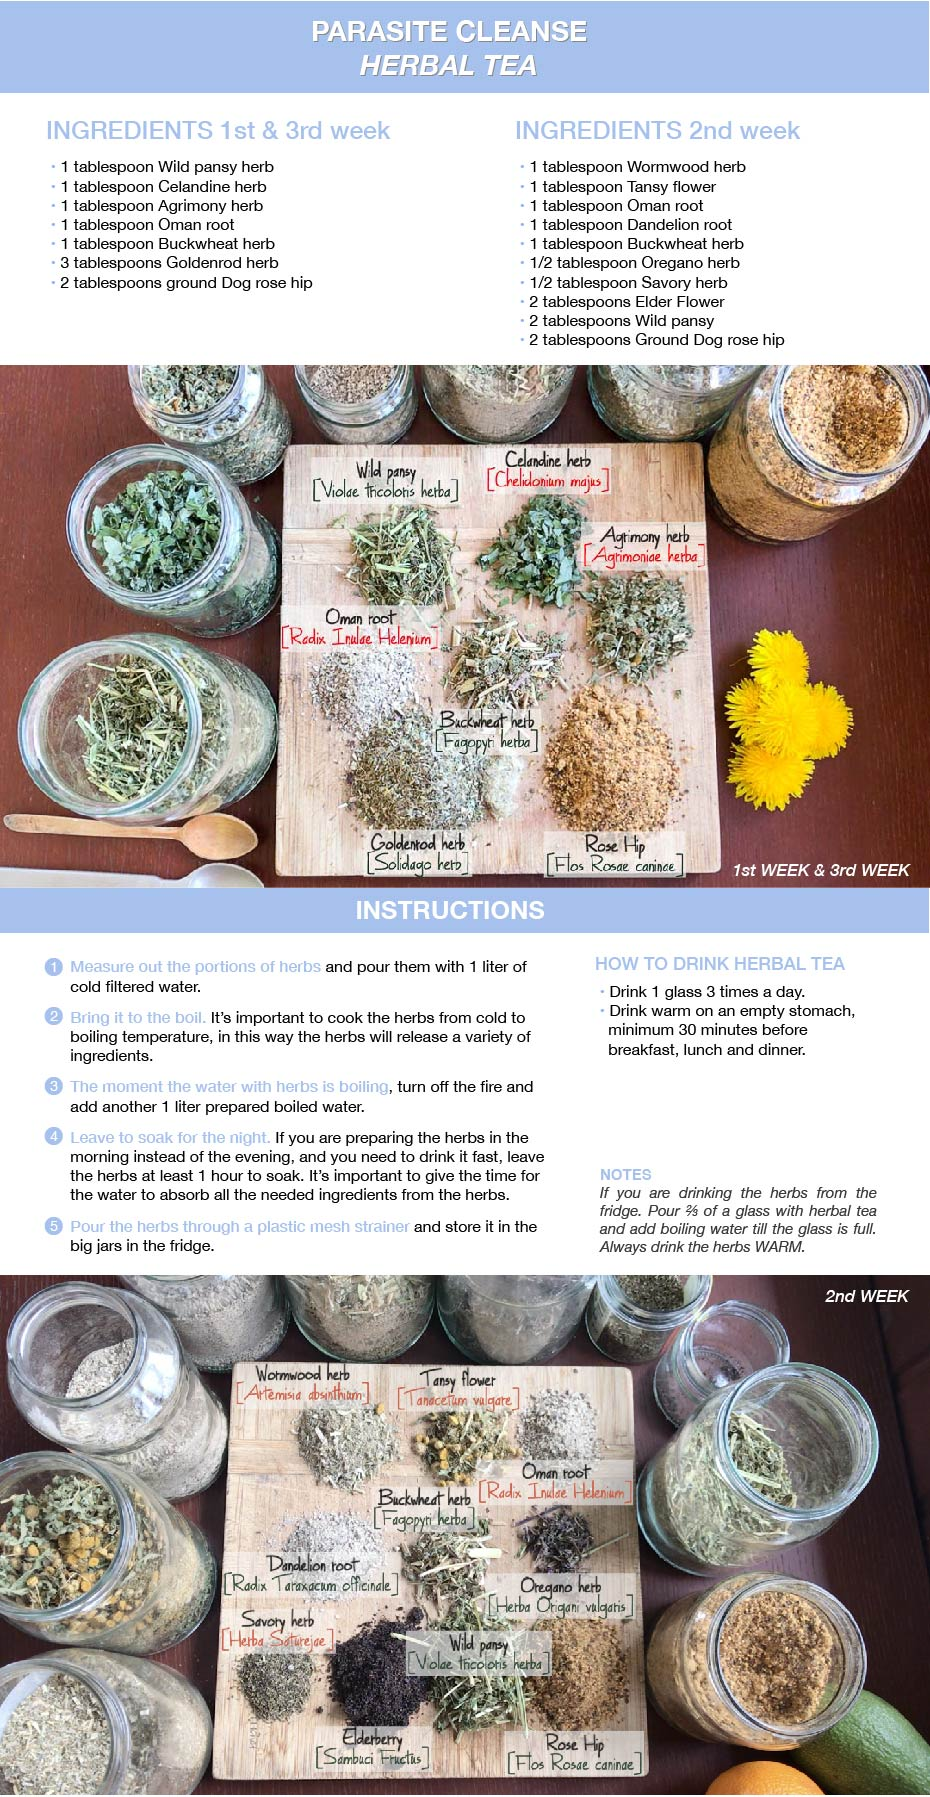 Parasite Cleanse Herbal Tea